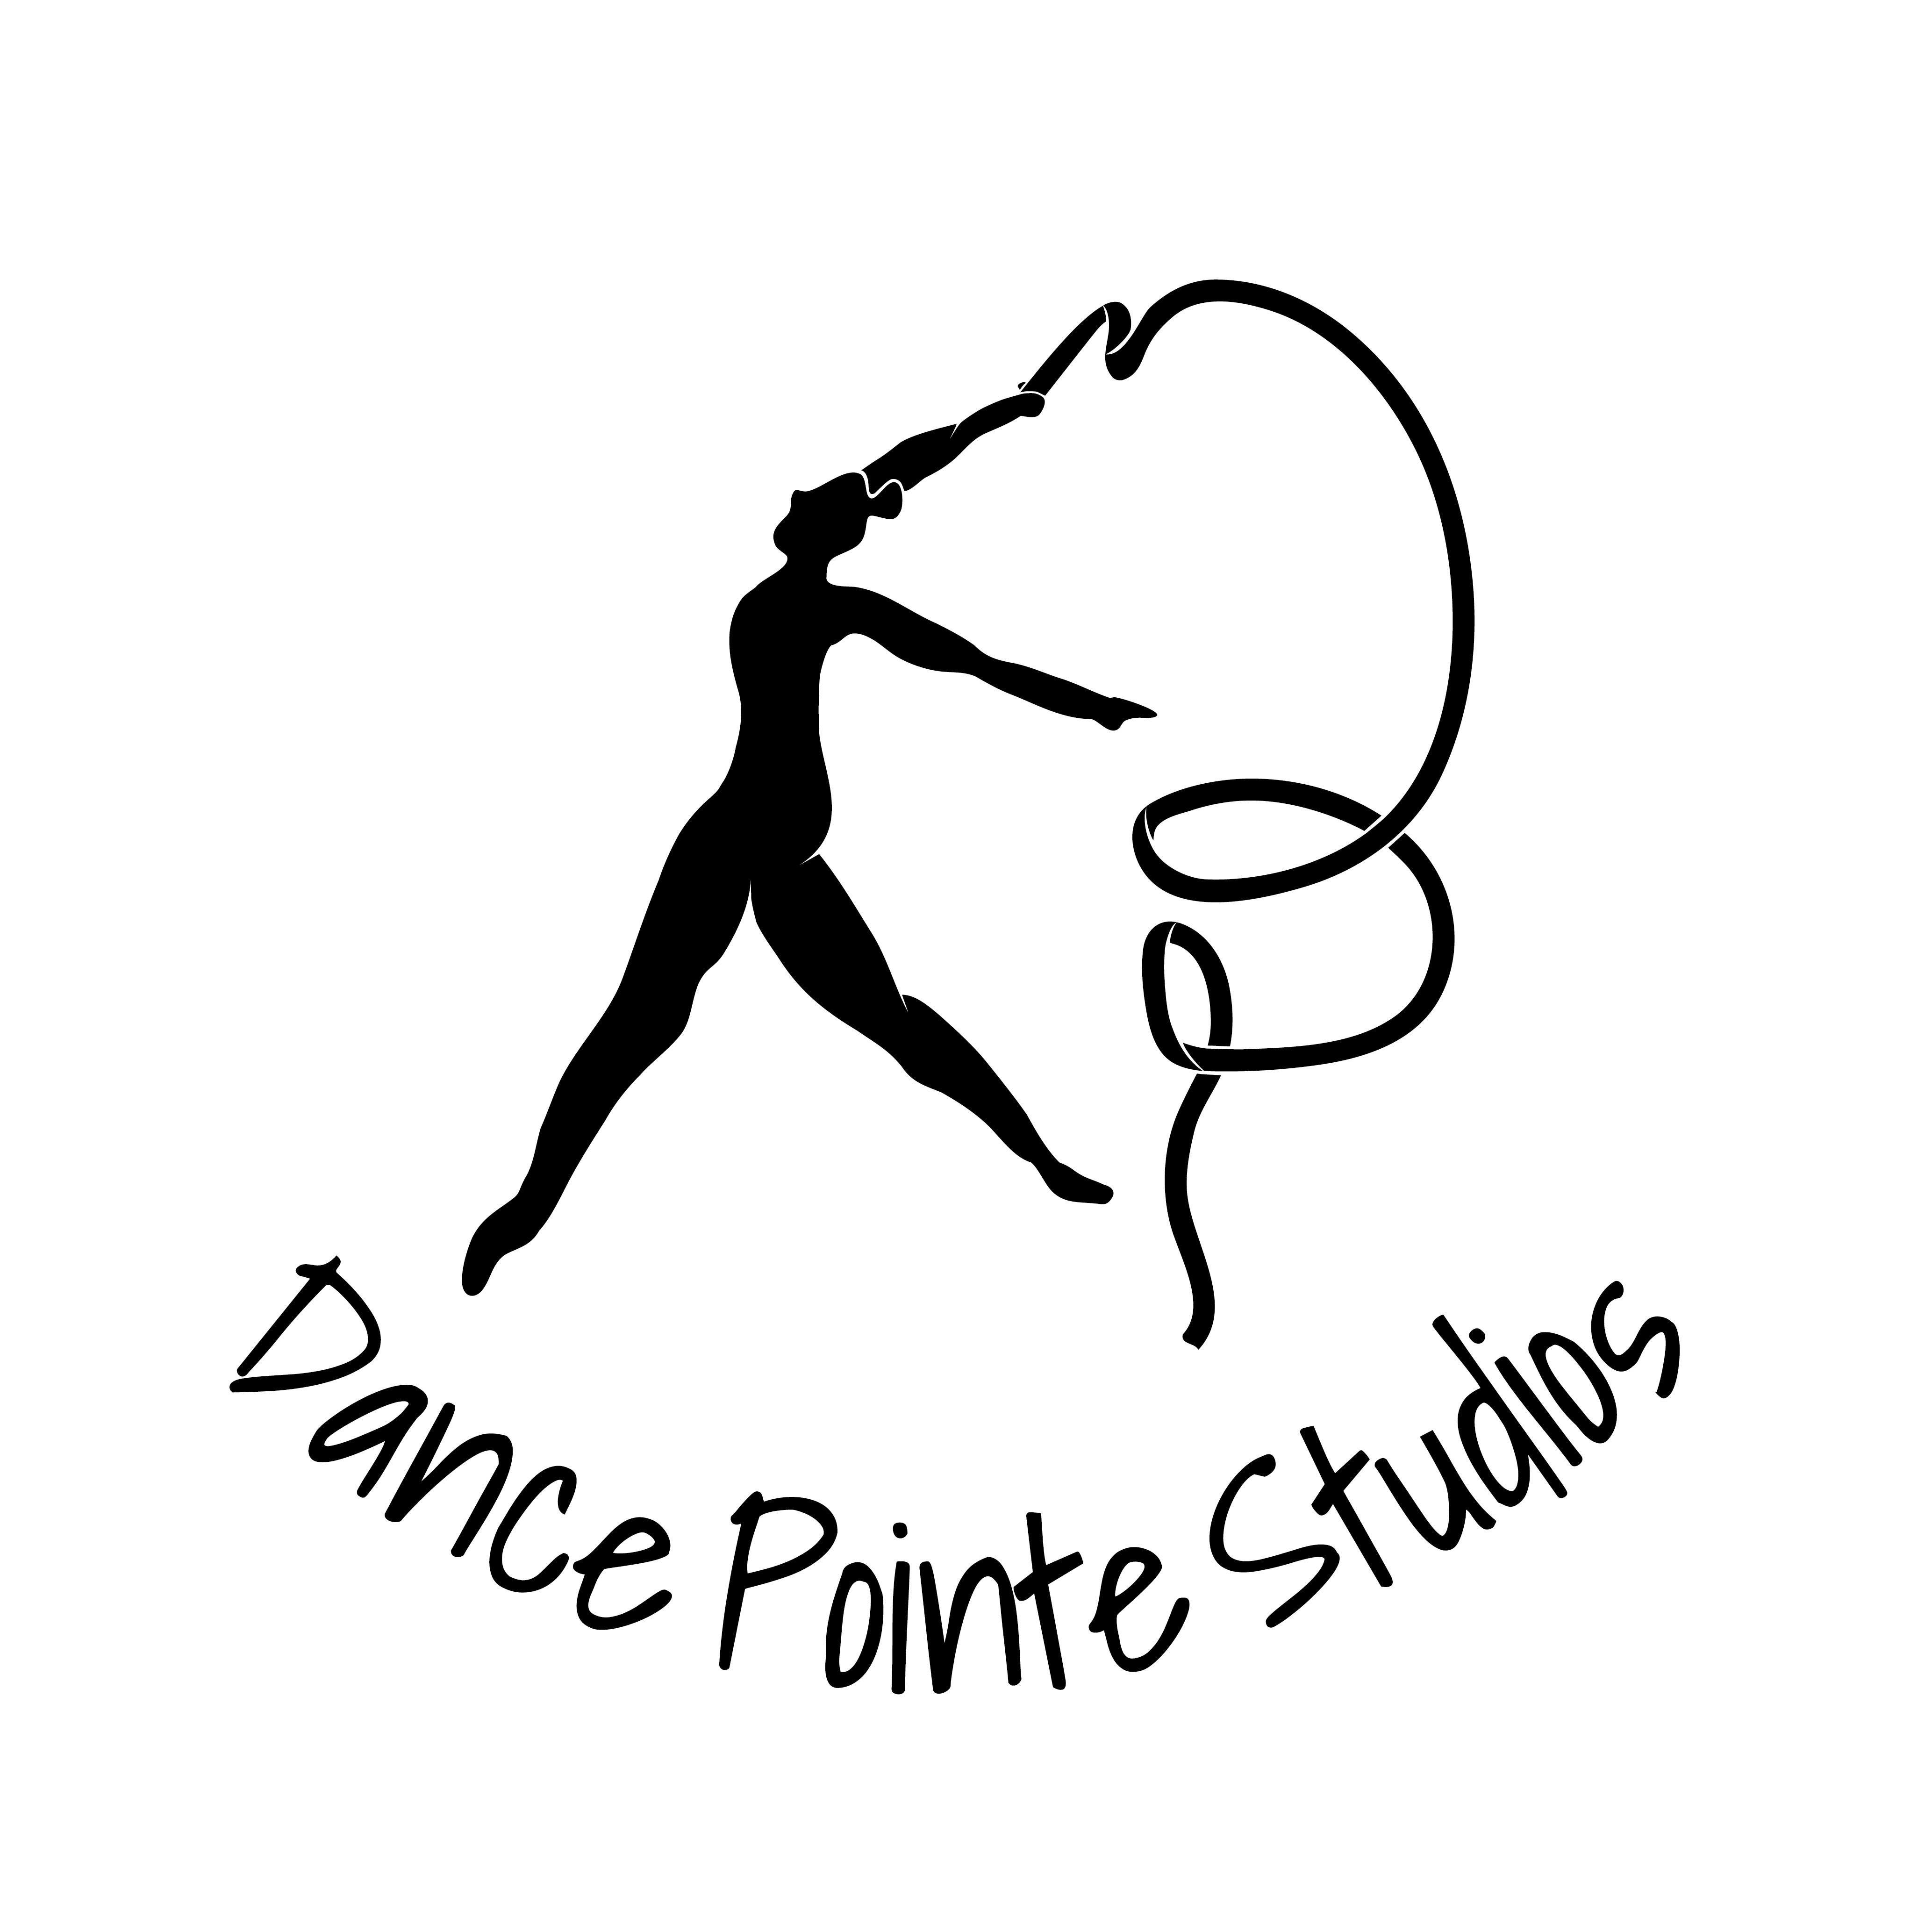 Dance Pointe Studios